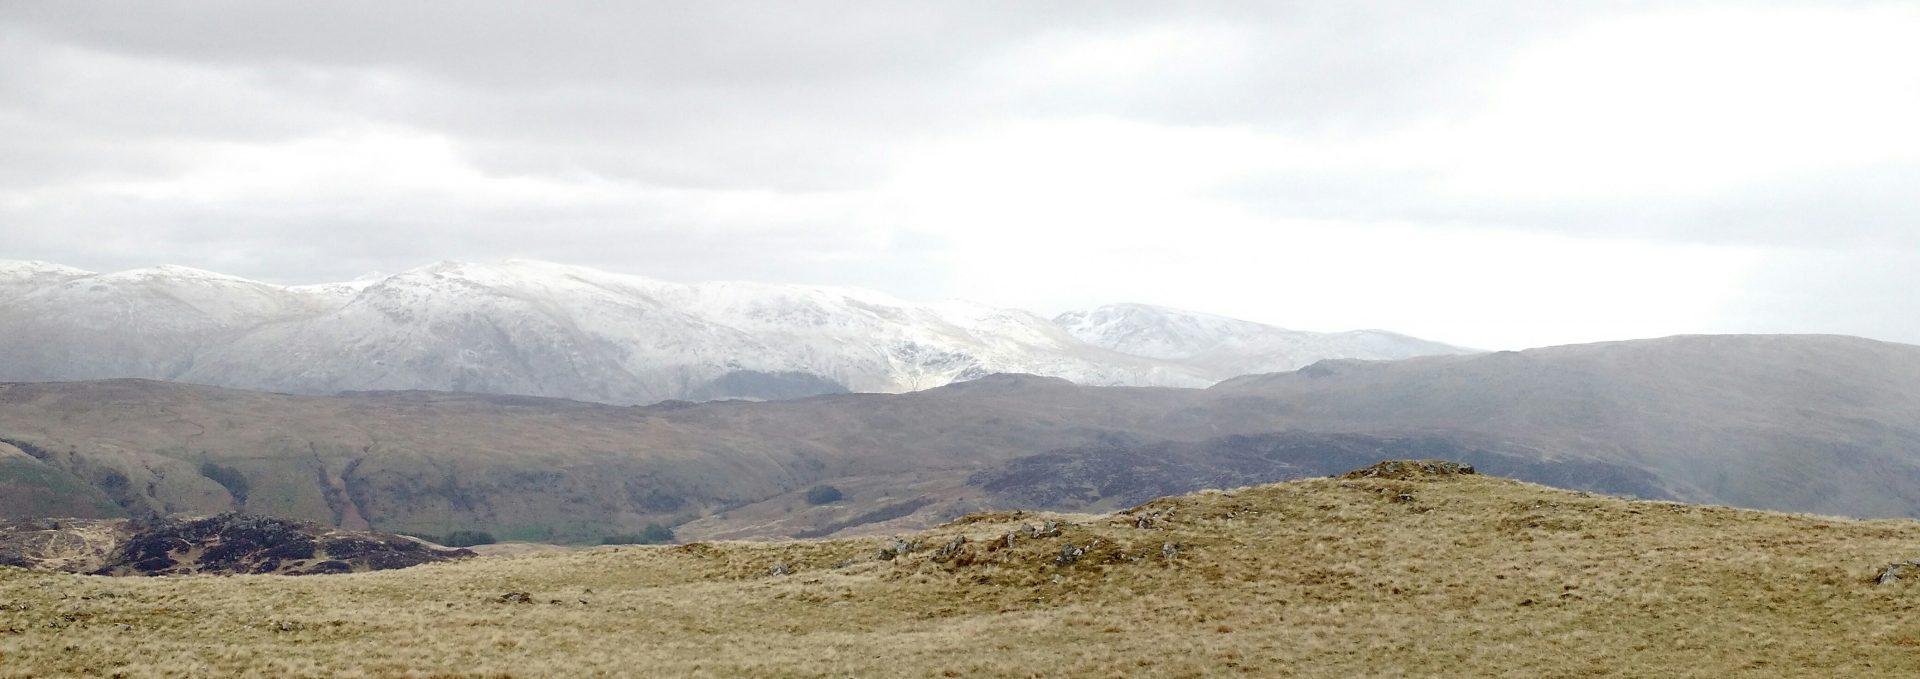 Snowy Helvellyn from Maiden Moor, near Rosthwaite